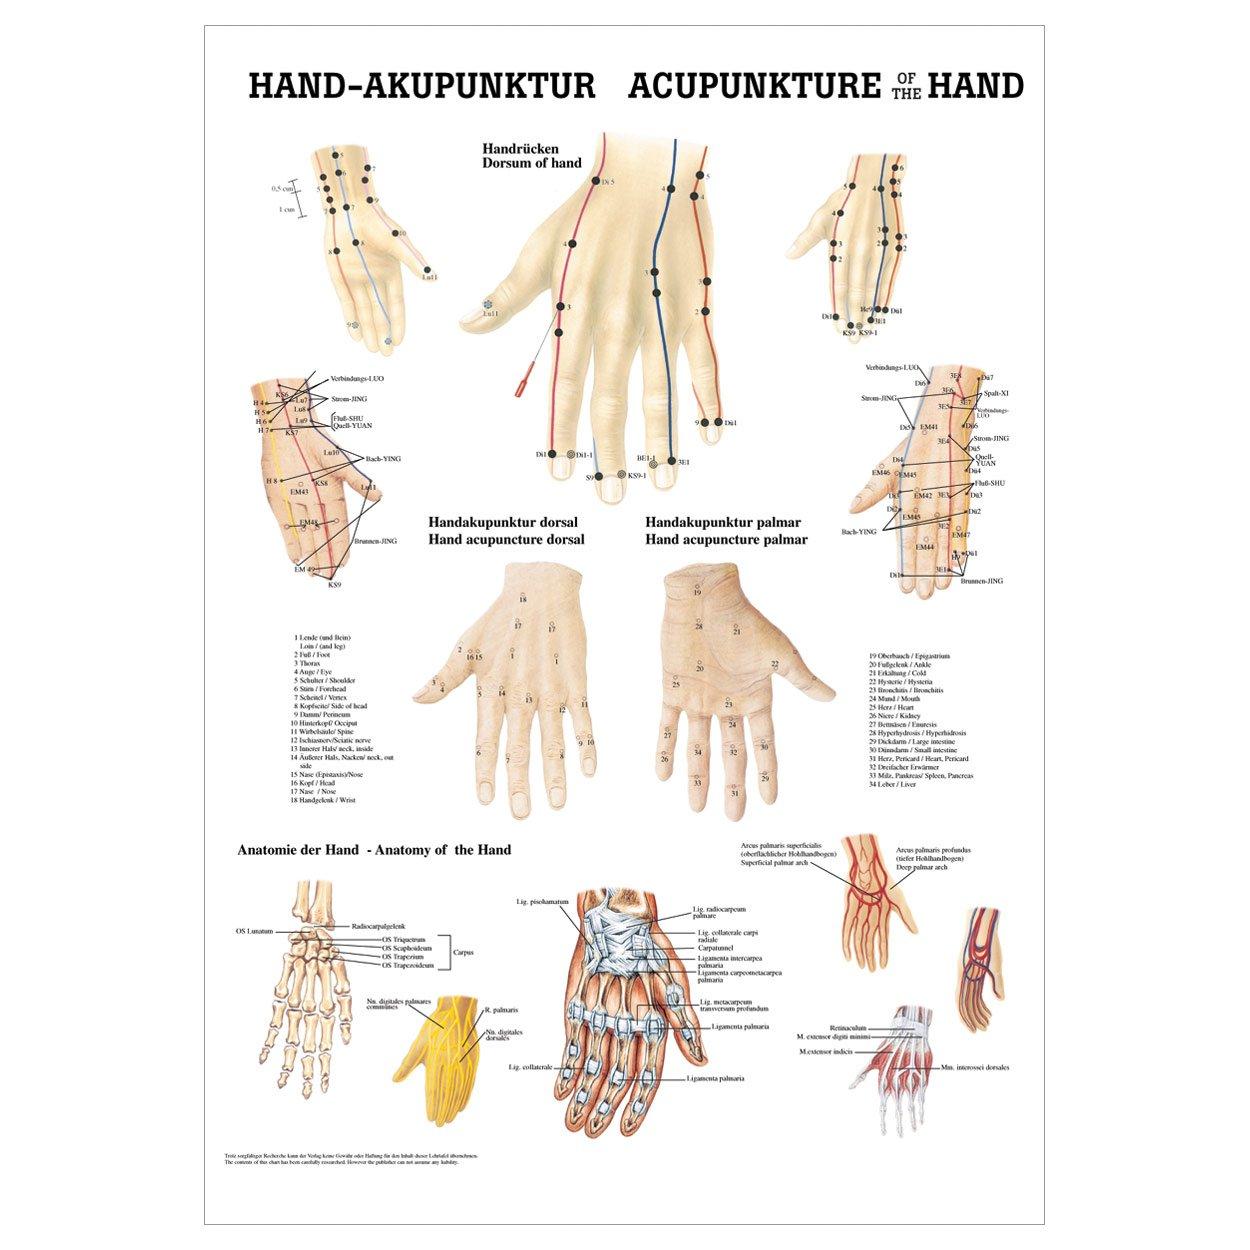 Hand-Akupunktur Mini-Poster Anatomie 34x24 cm medizinische ...